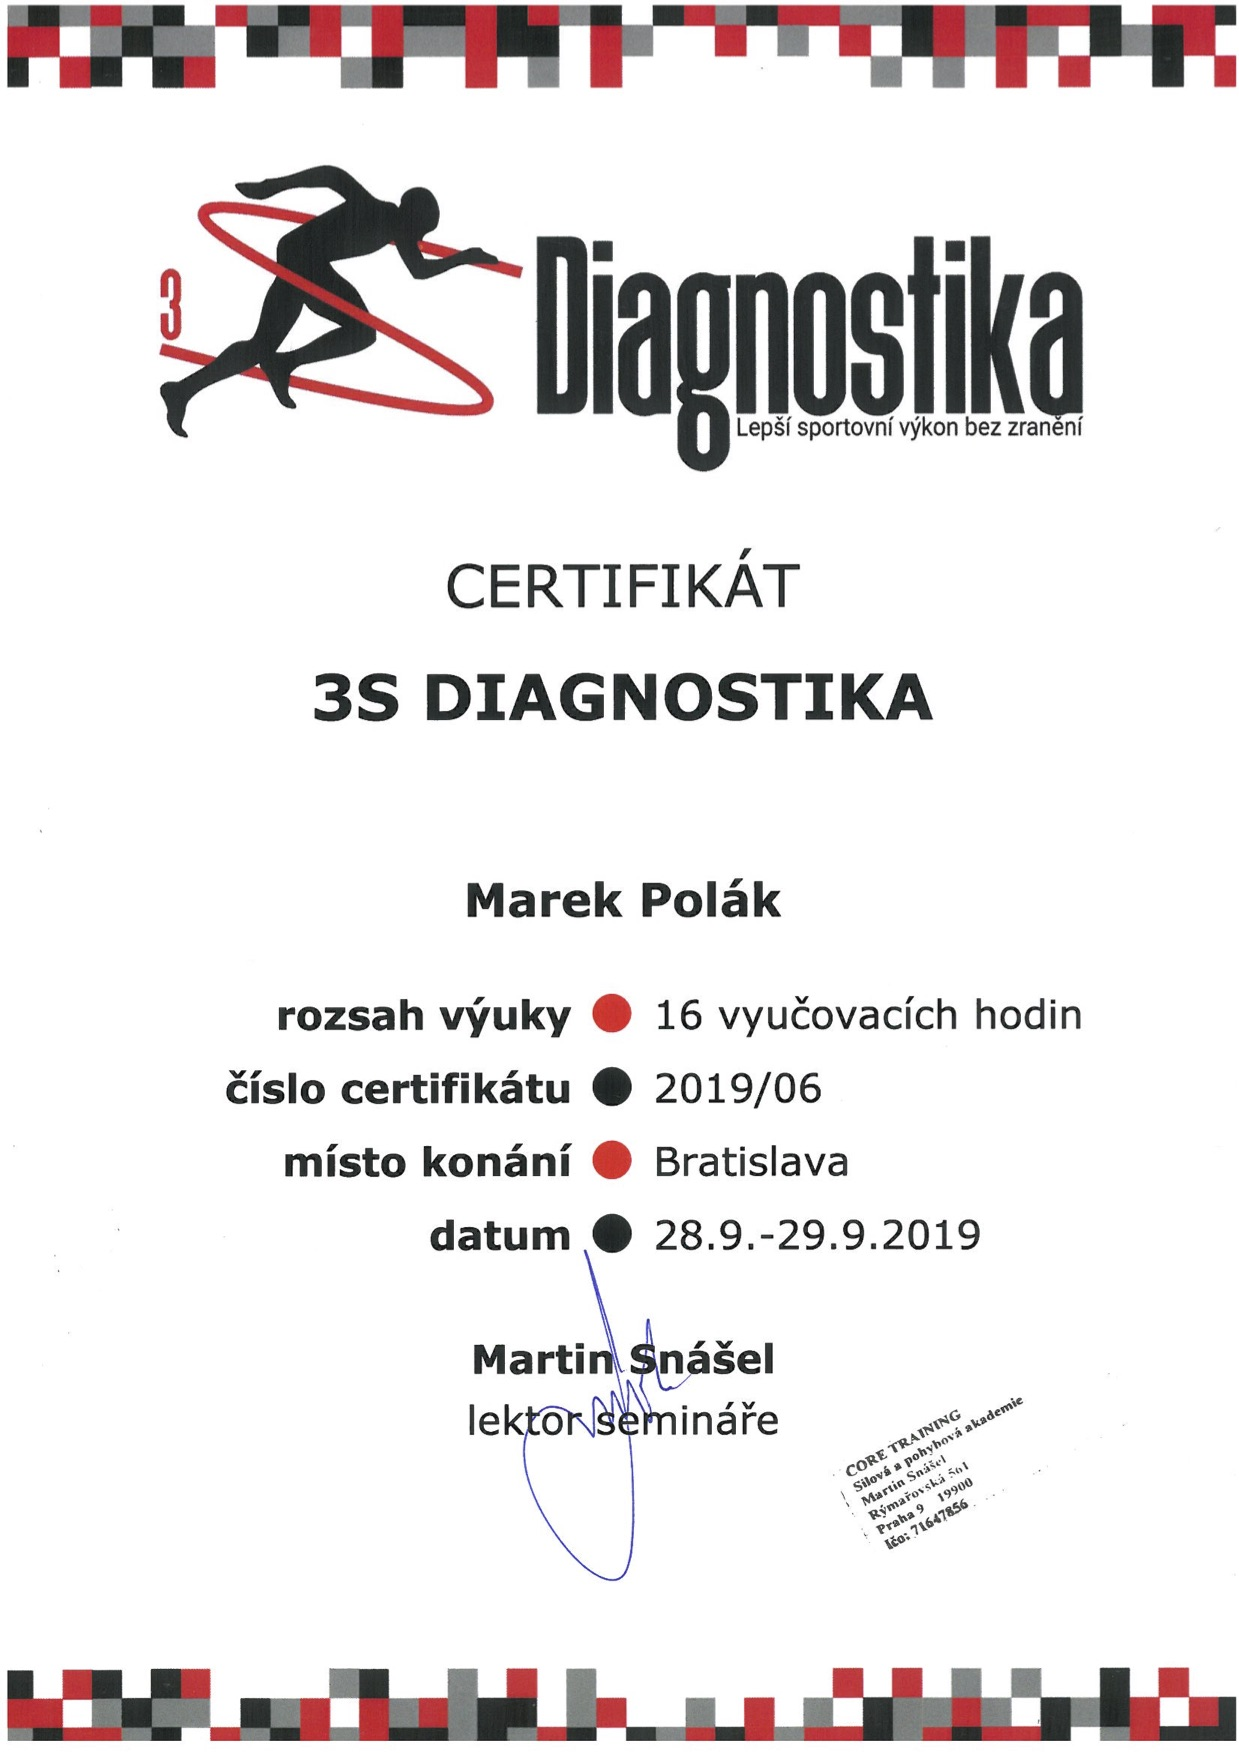 Certifikát 3S Diagnostika Marek Polák